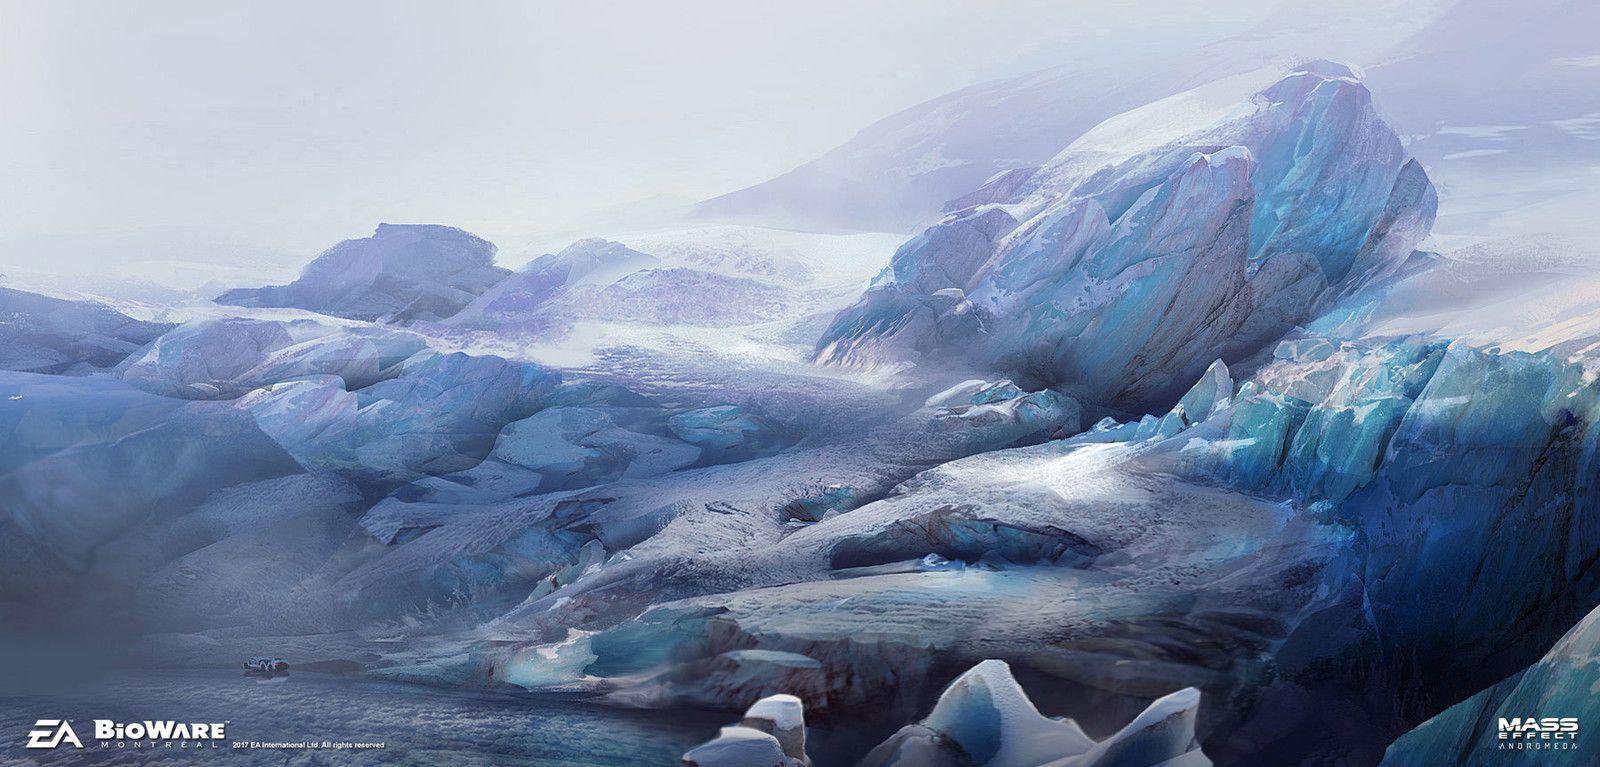 Mass Effect Andromeda - Ice planet exploration sketches, Ben Lo on ArtStation at https://www.artstation.com/artwork/zo5z2